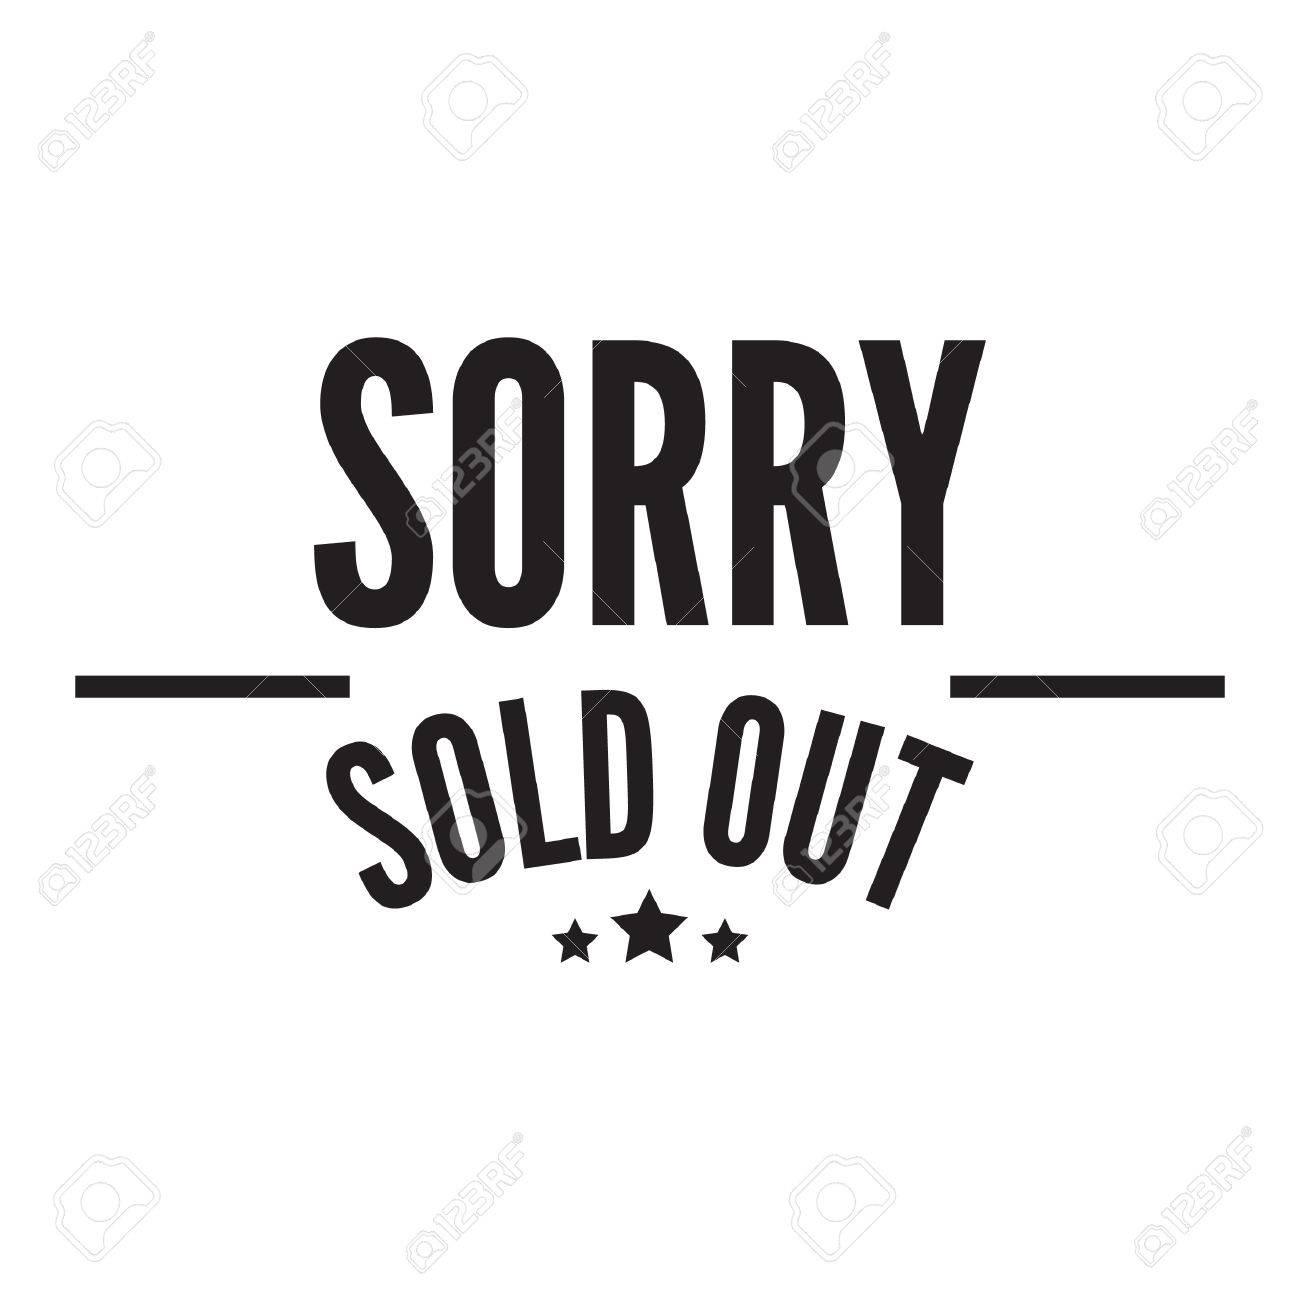 Désolé vendu